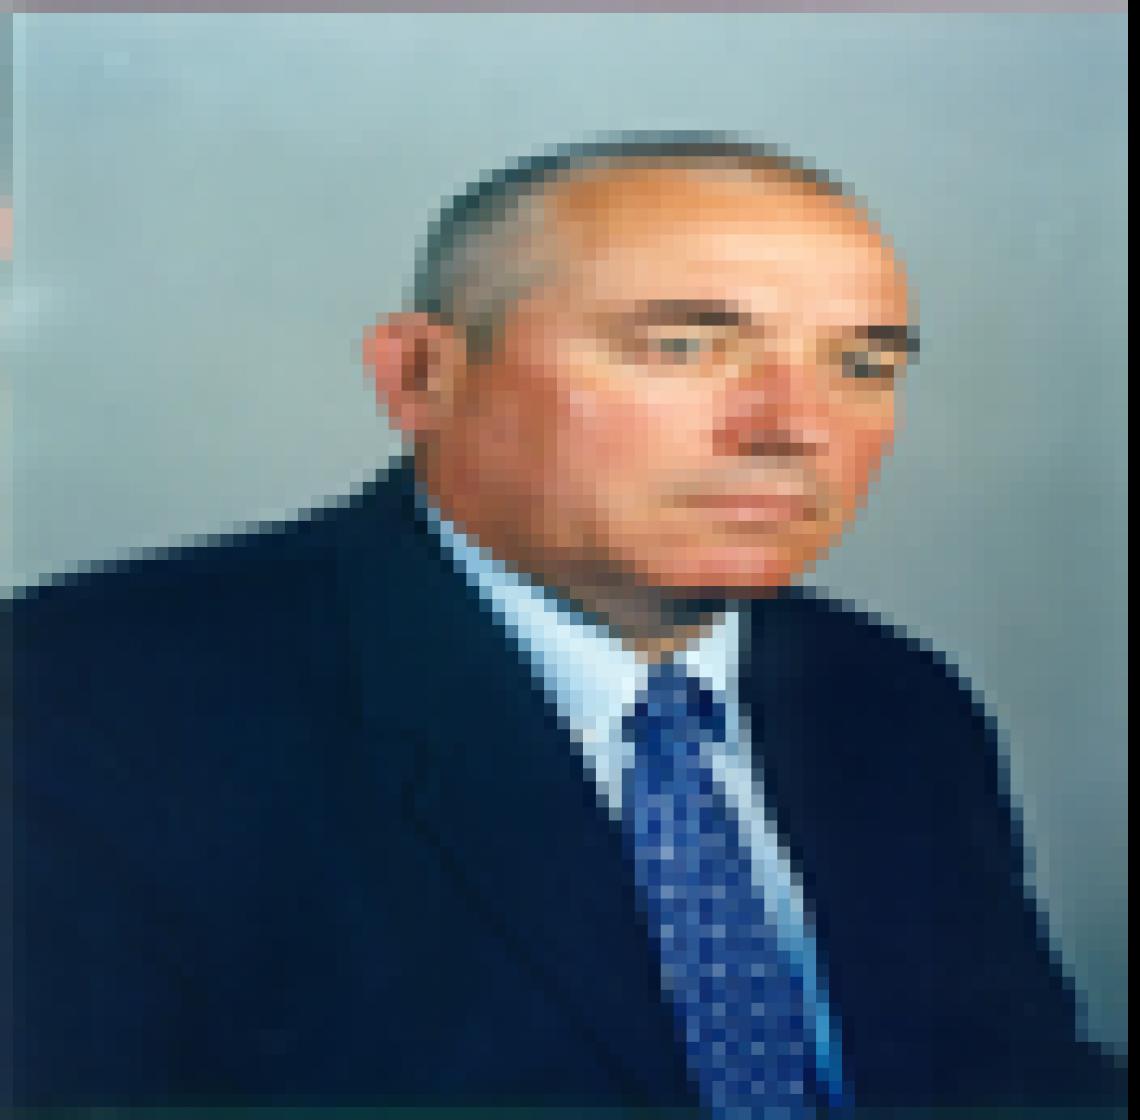 Prof. univ. dr. ing. Gheorghe GUTT